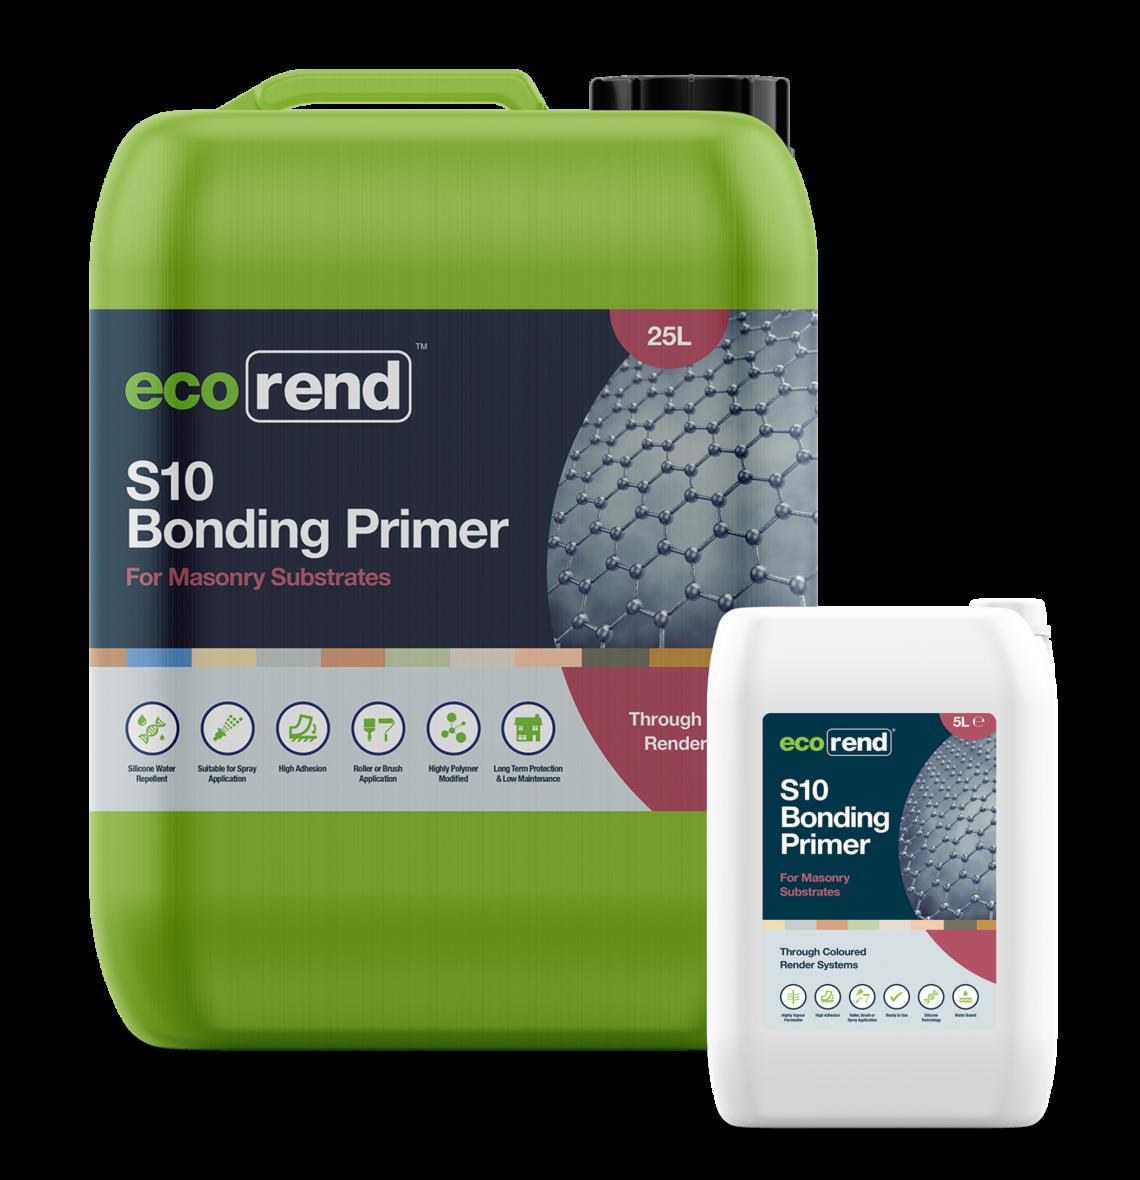 S10 – Bonding Primer High Adhesion